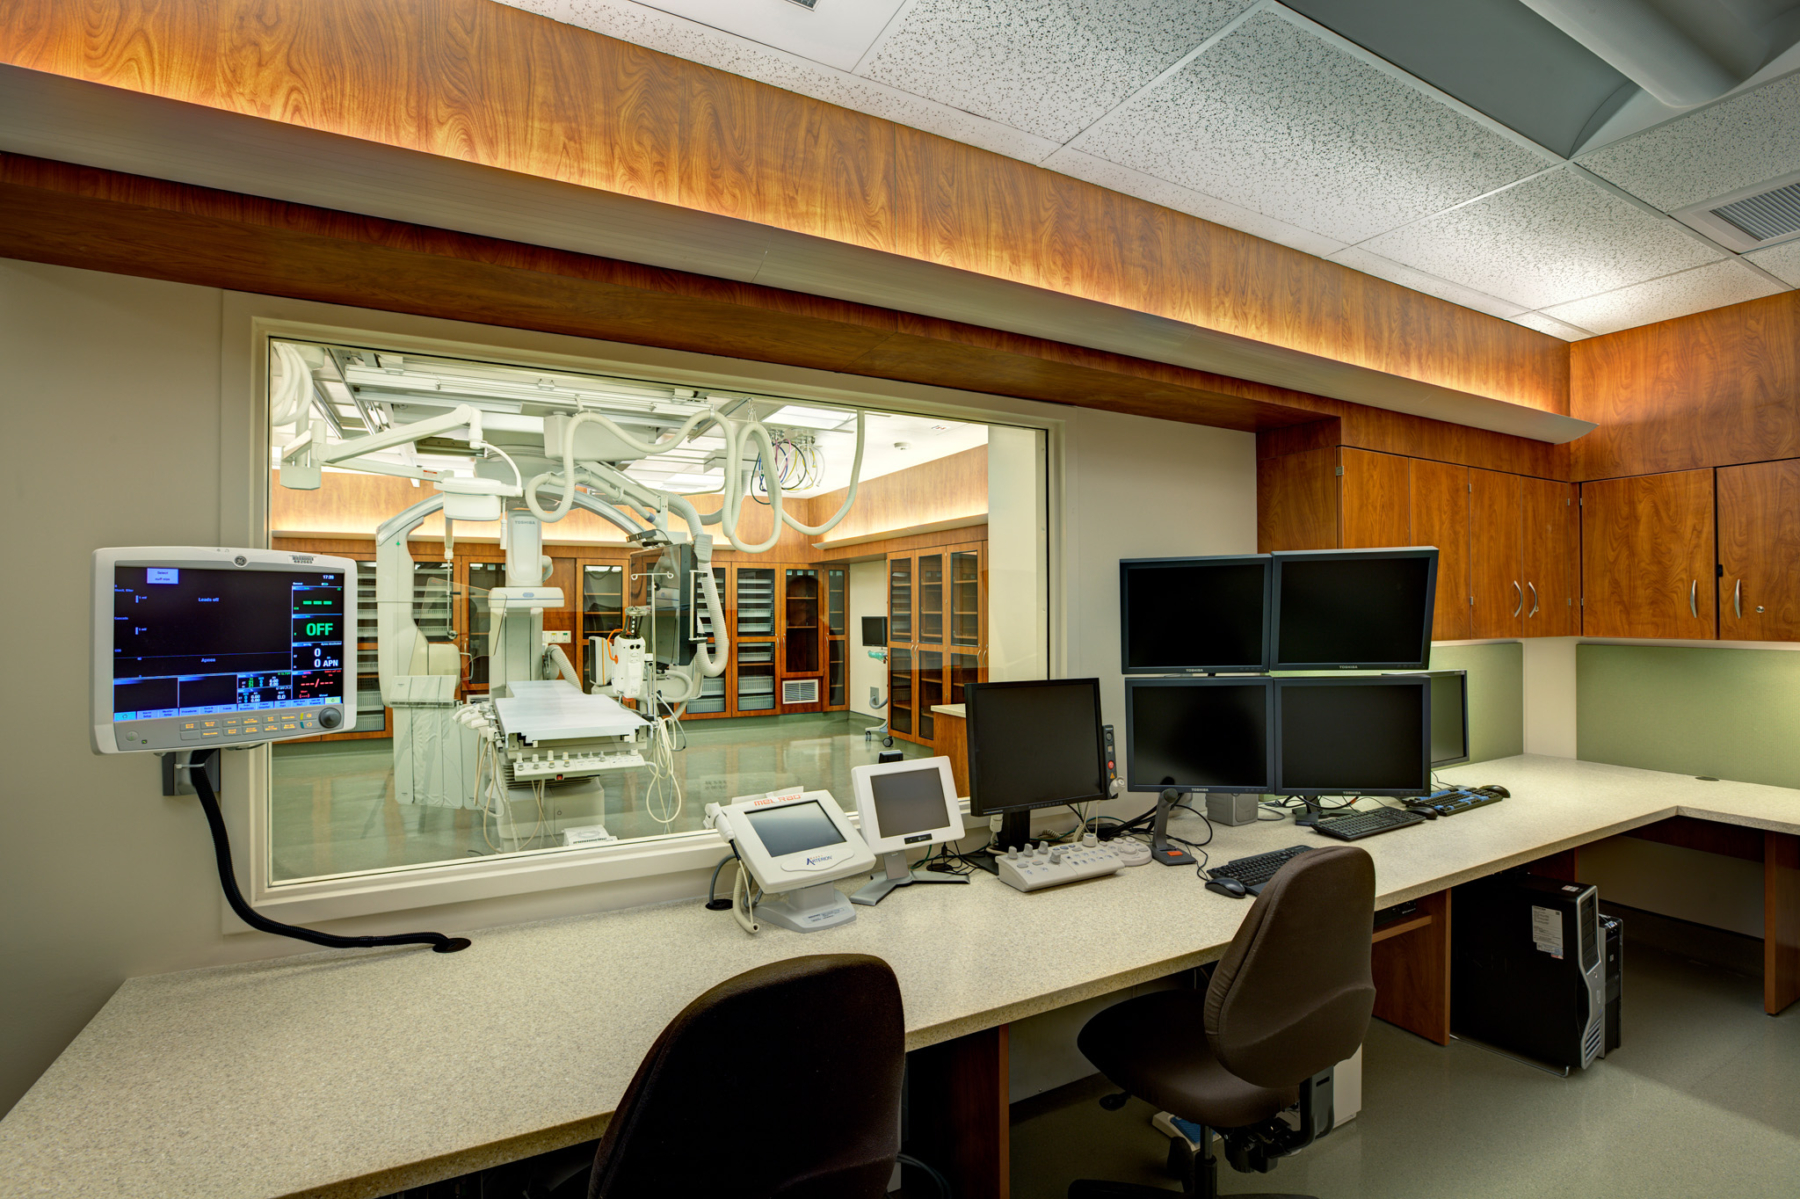 Photo of Bi-Plane Imaging Control Room